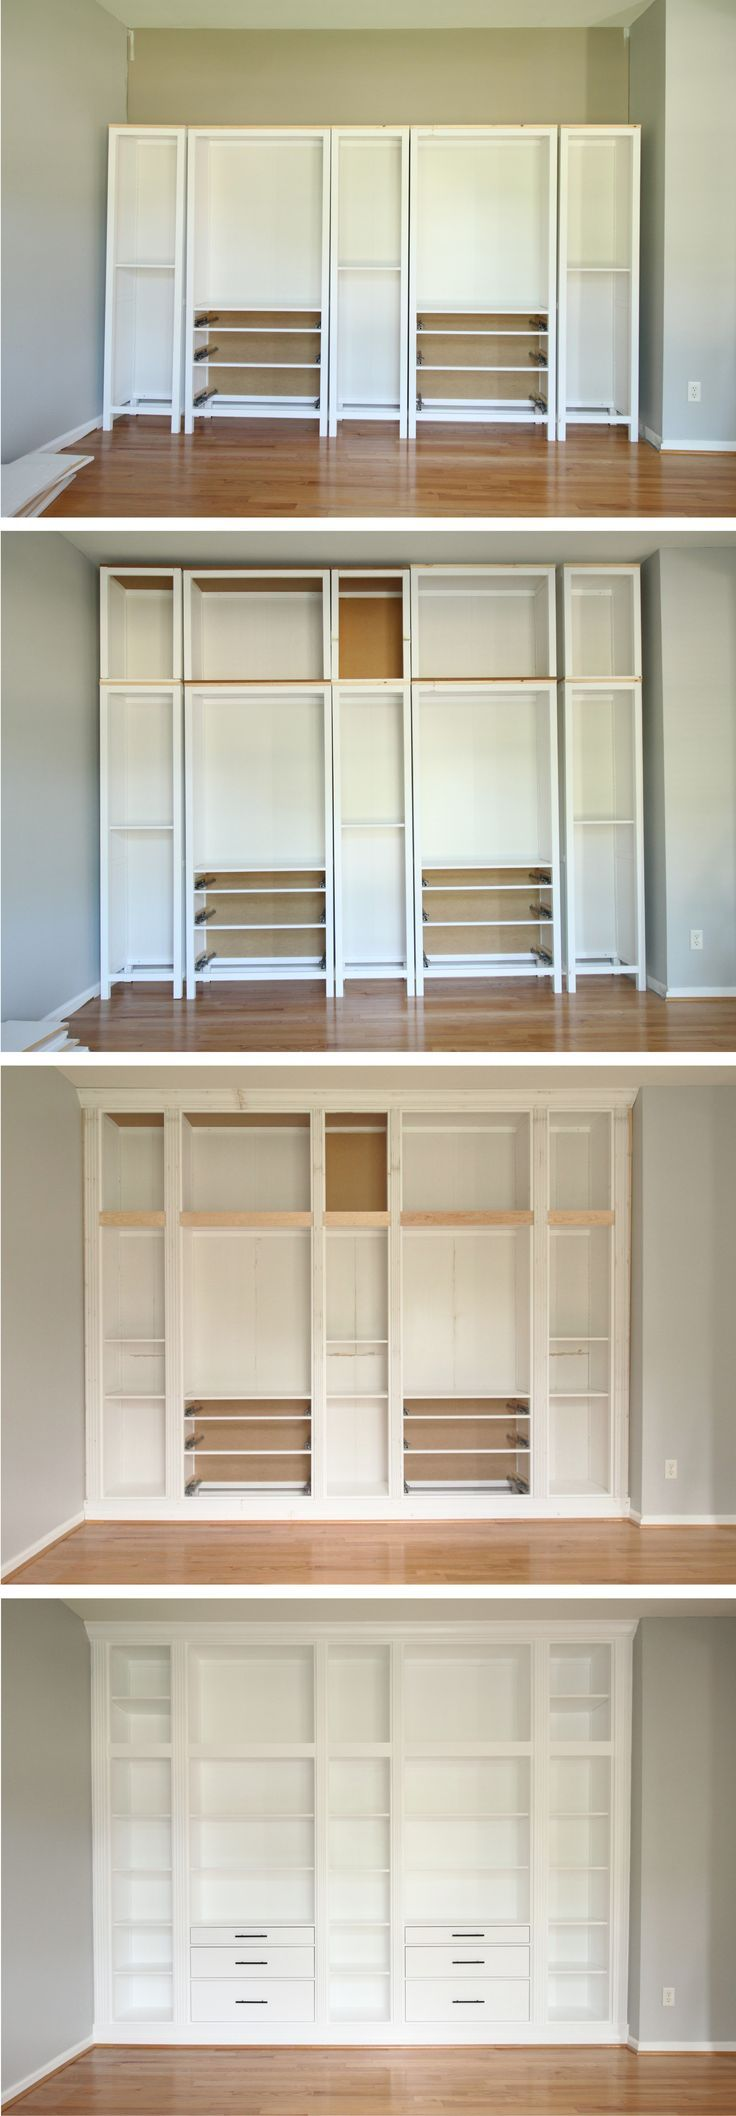 diy built in bookcase reveal an ikea hack diys to try m bel haus ikea. Black Bedroom Furniture Sets. Home Design Ideas